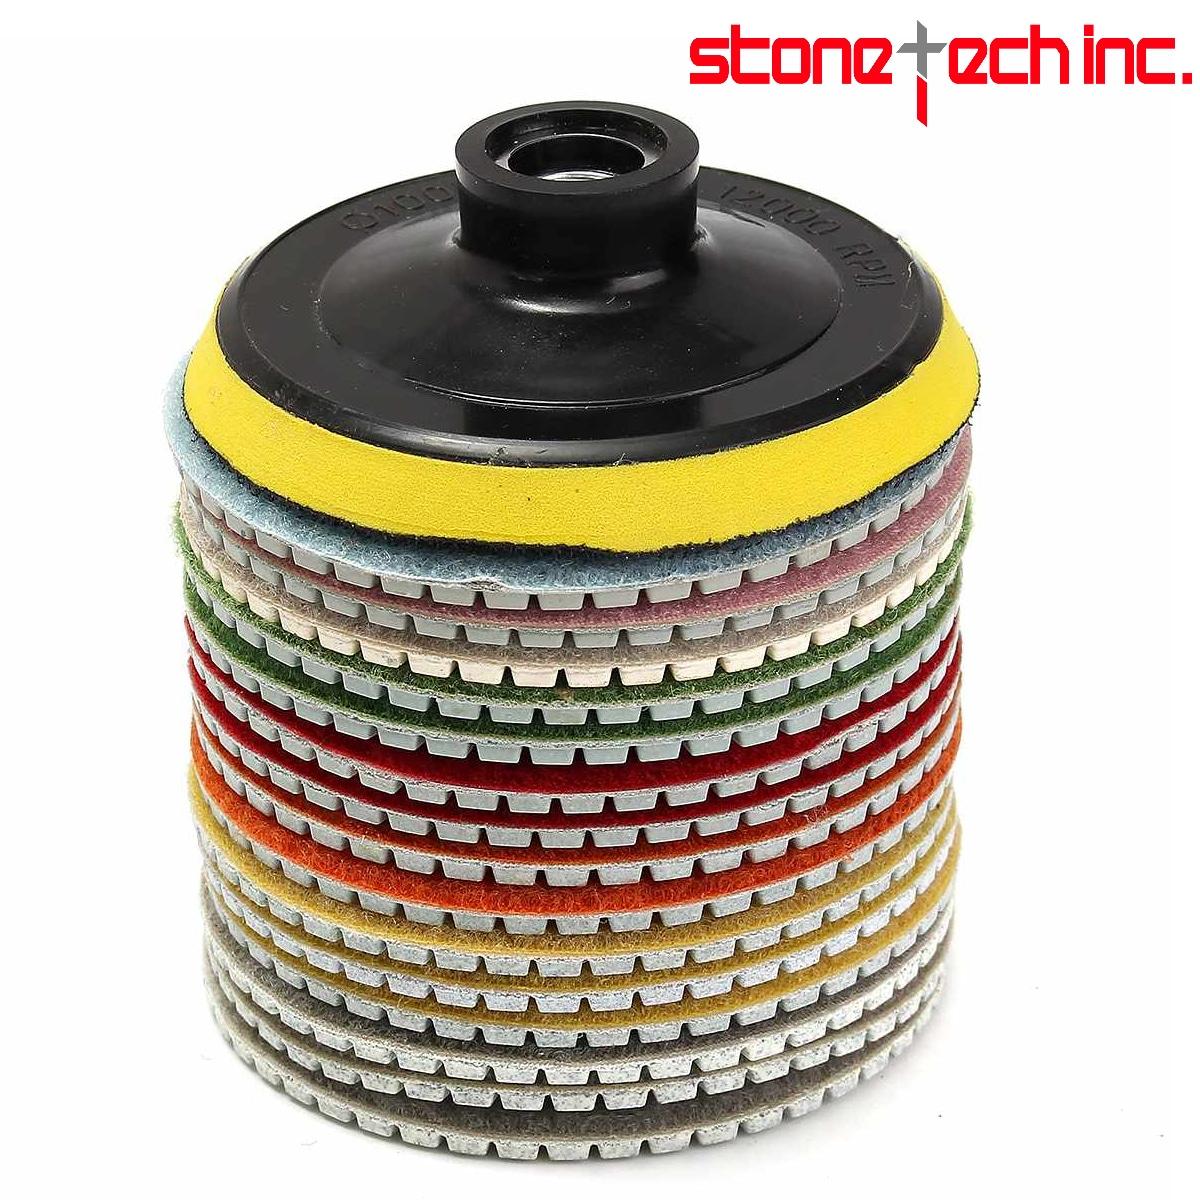 16pcs Diamond Polishing Pads Kit 4 inch 100mm Wet/Dry for Granite Stone Concrete Marble Polishing Use Grinding Discs Set